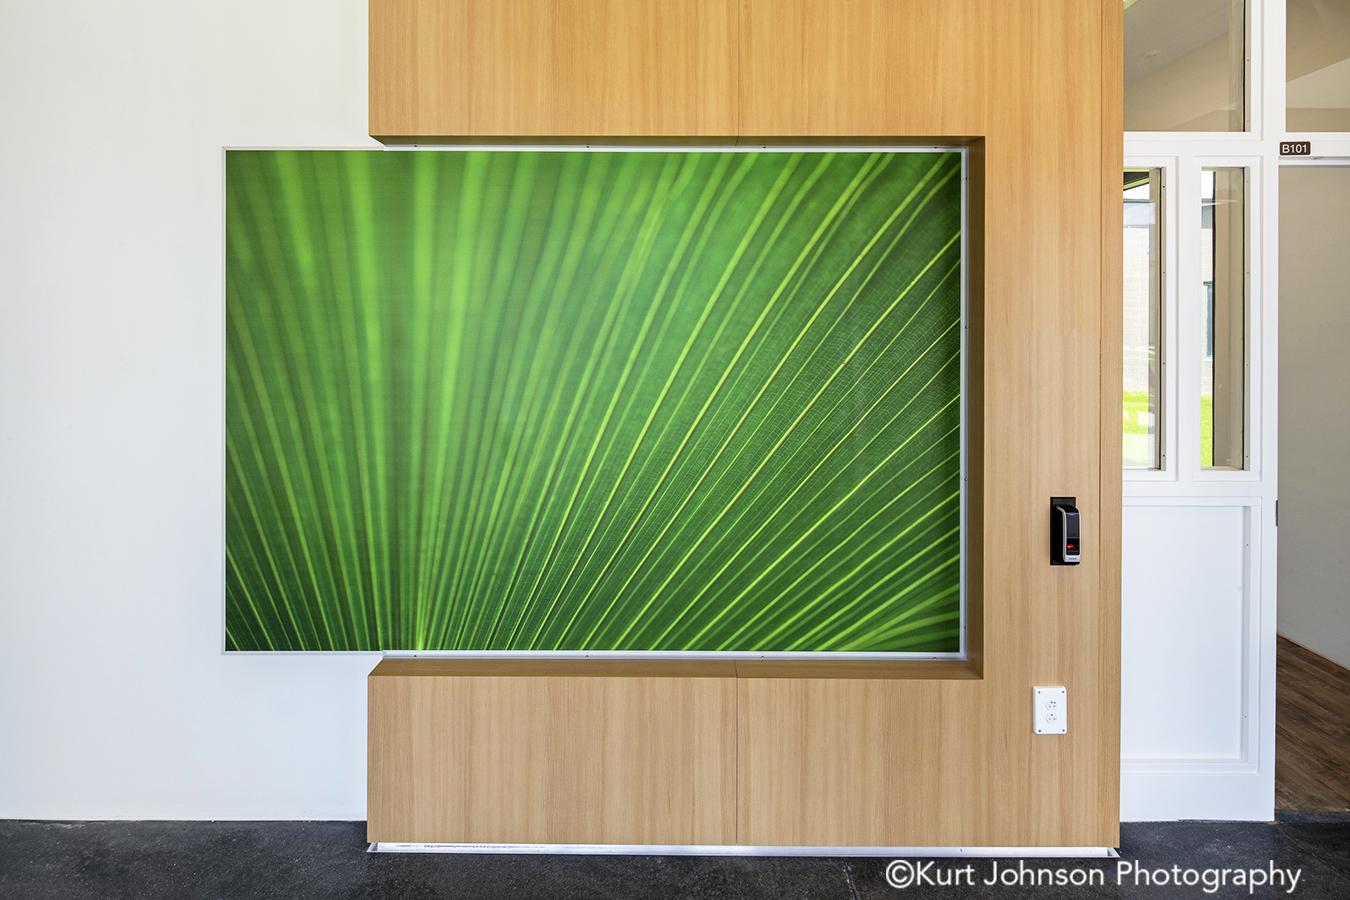 fulton state hospital missouri mo behavioral heath Koroseal vinyl wallcovering green grass corridor hallway wayfinding art install installation